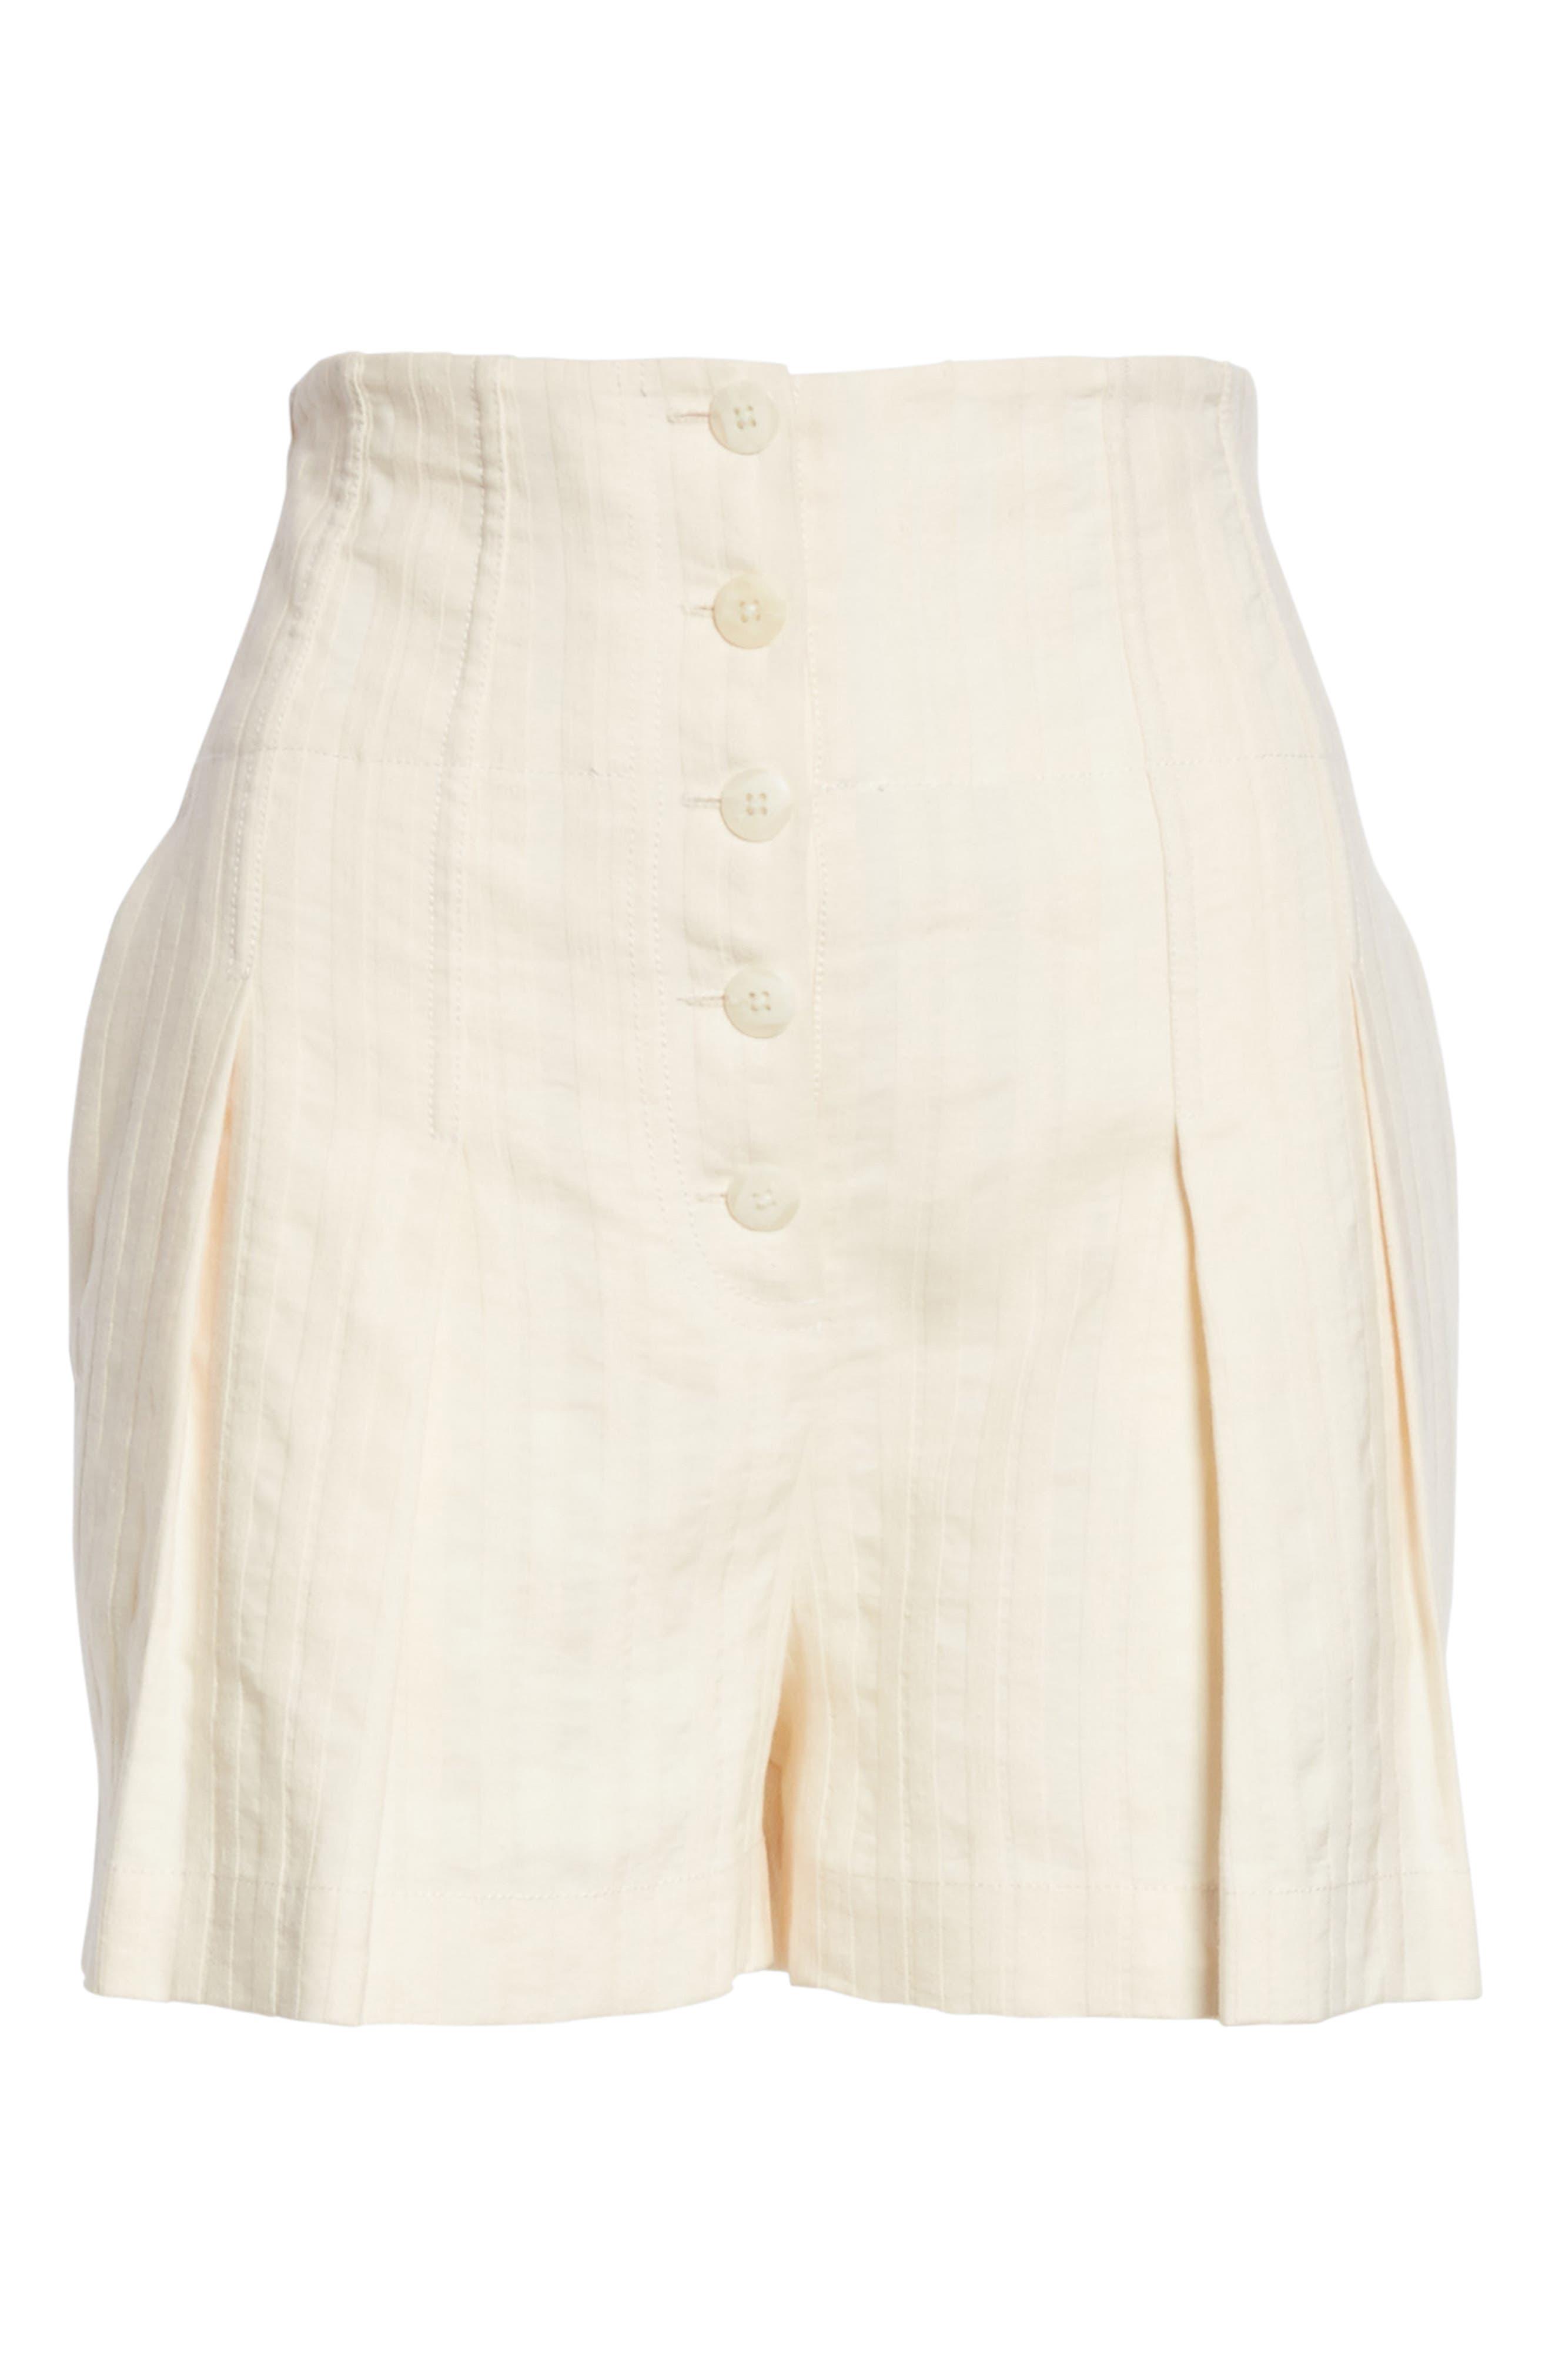 Textured Stripe Shorts,                             Alternate thumbnail 6, color,                             255